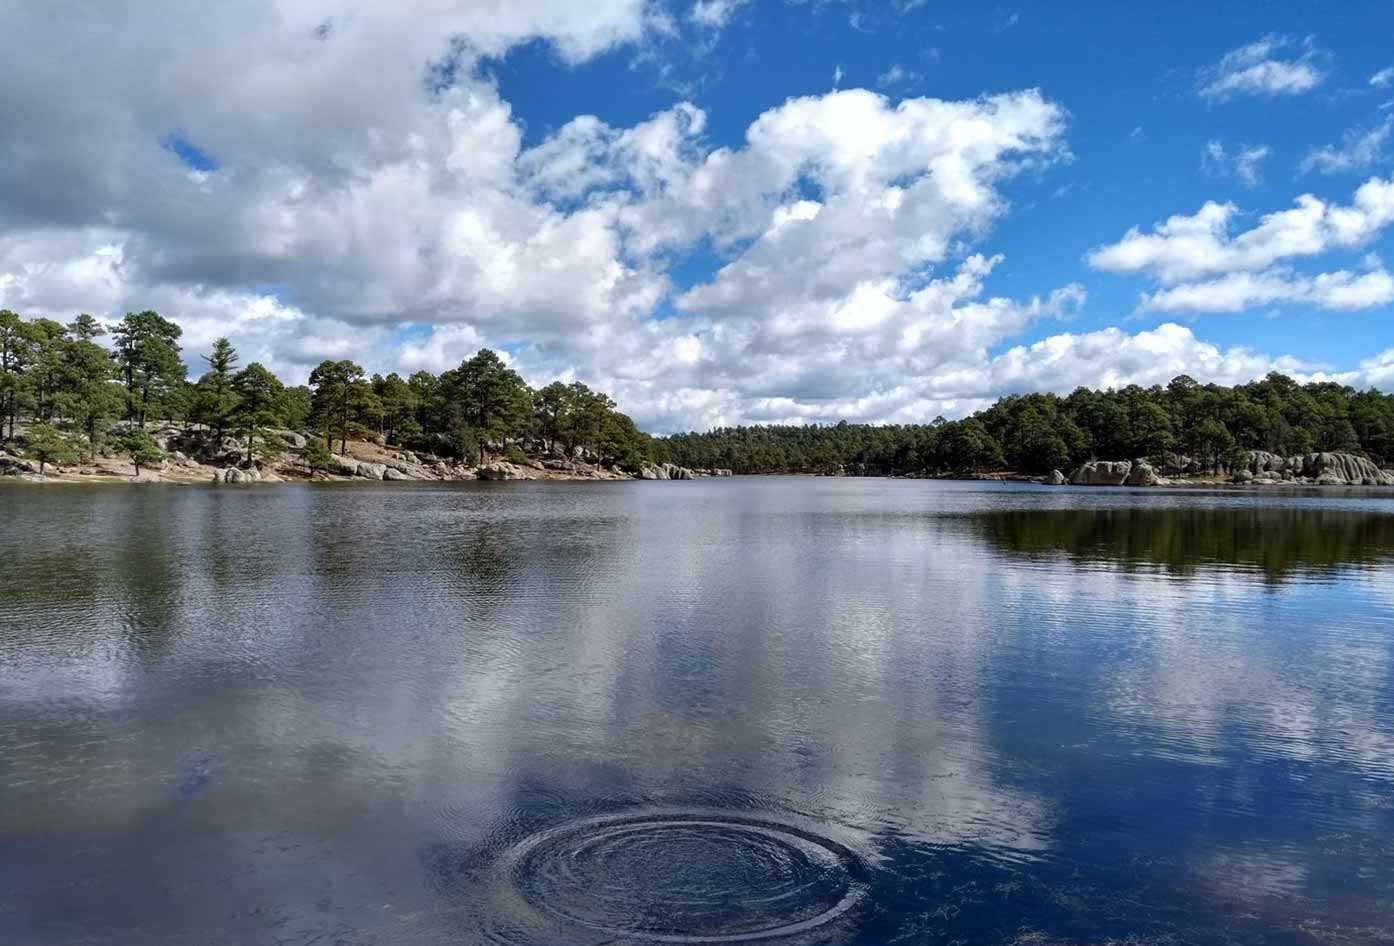 lake arareco